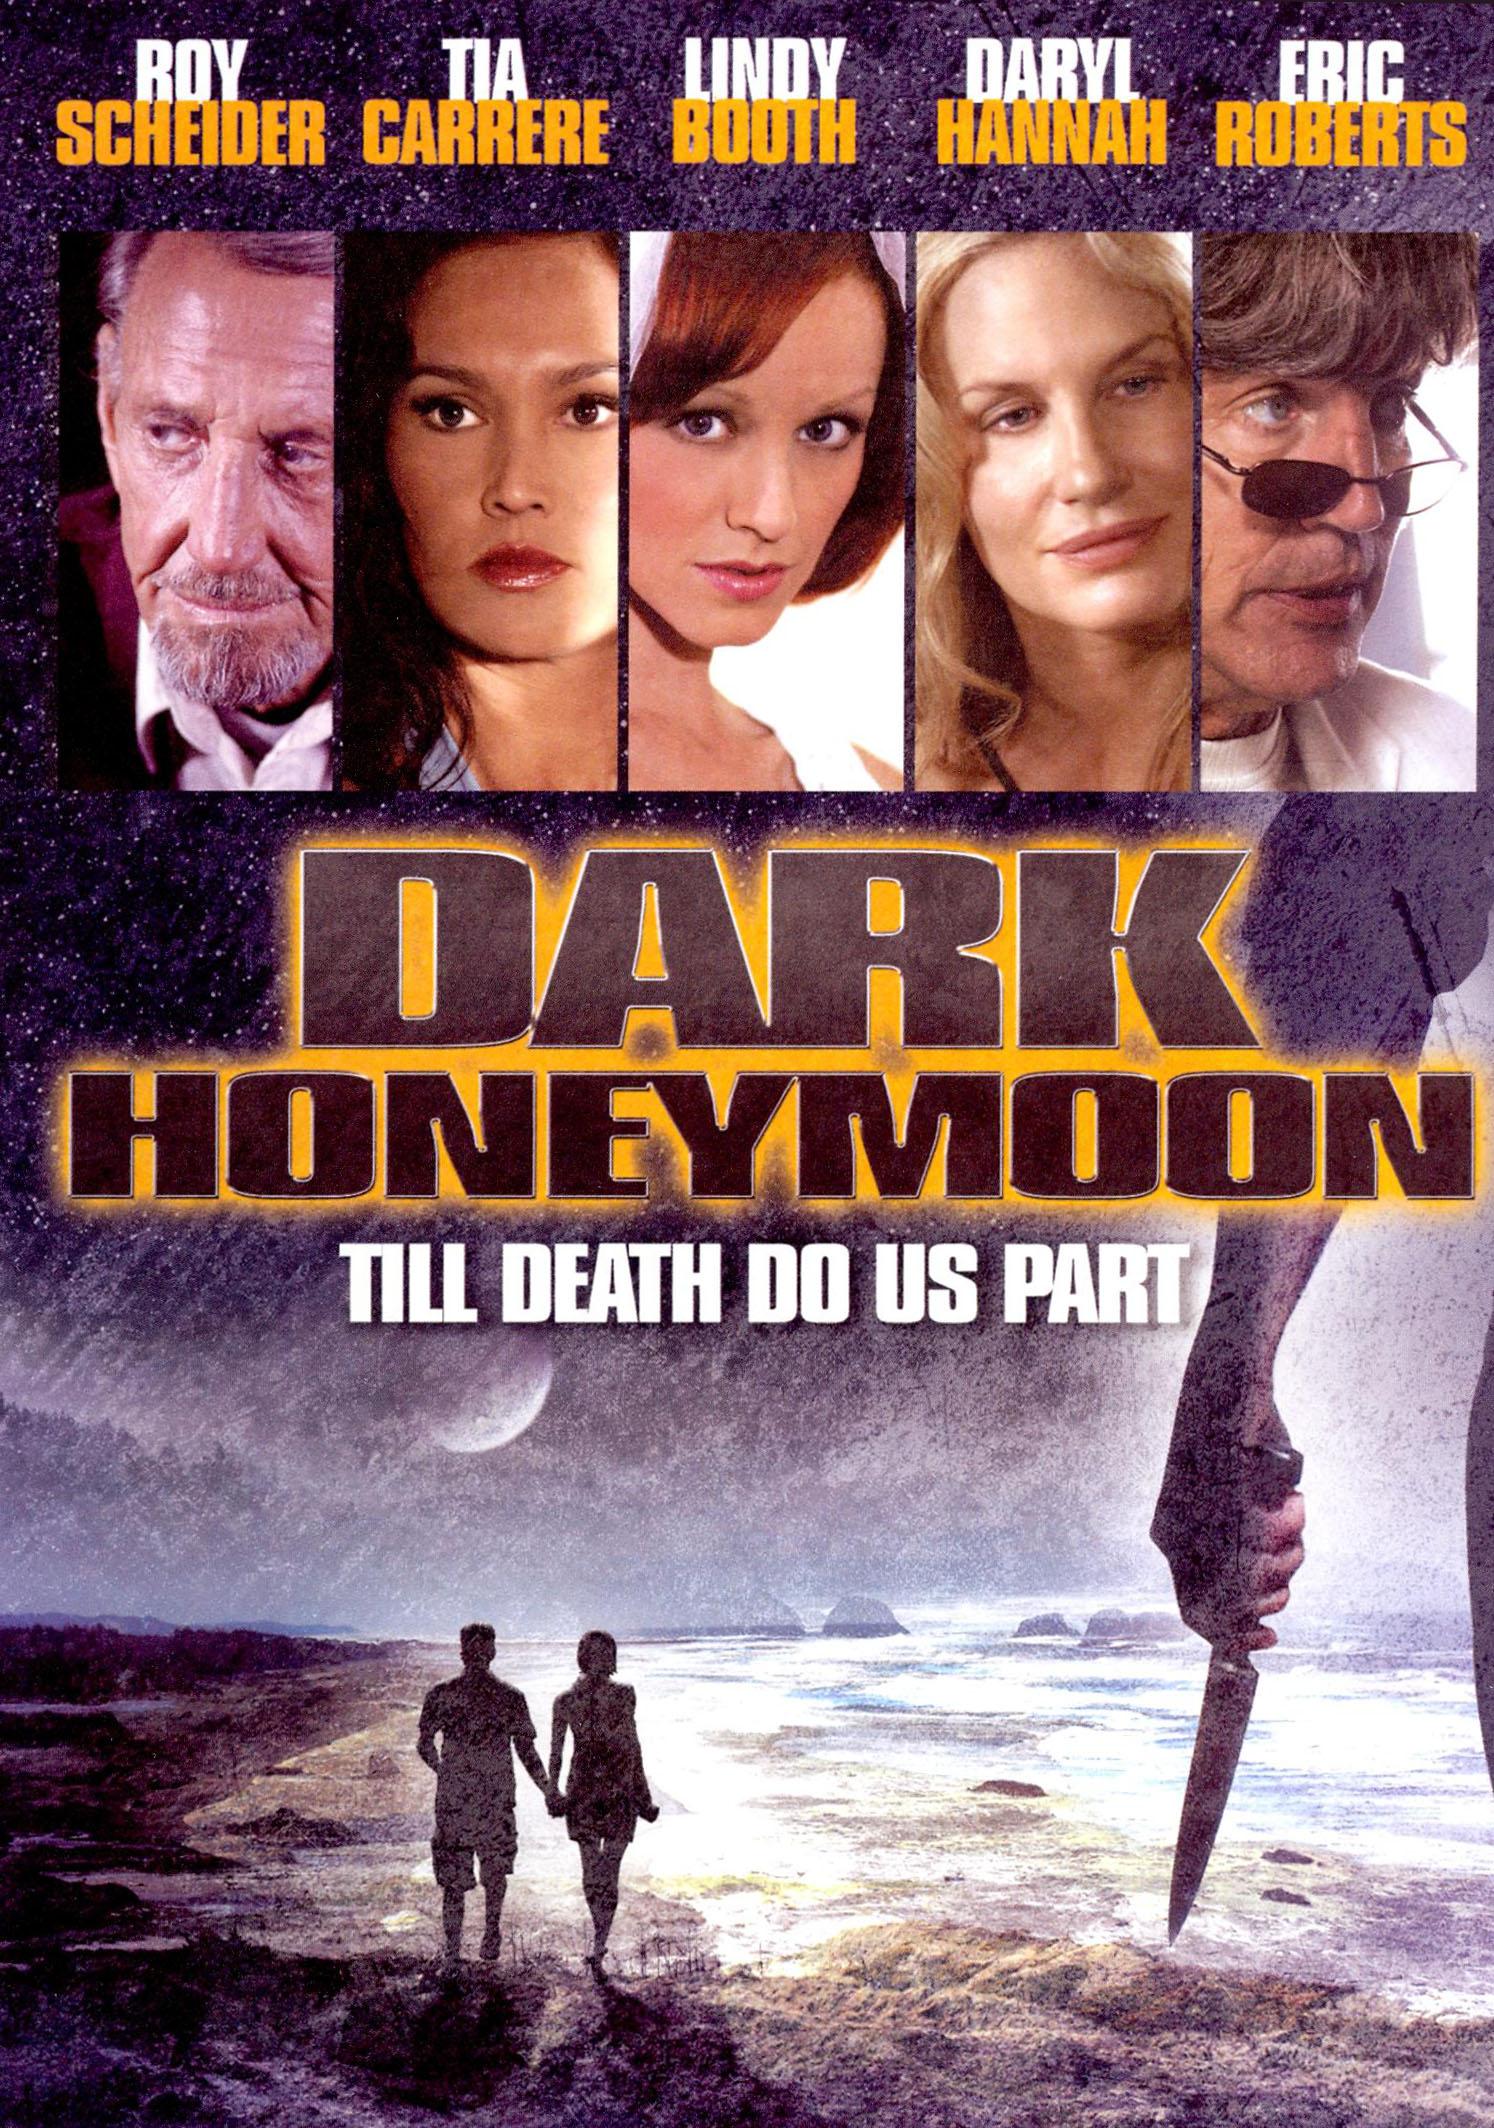 Dark Honeymoon (2007) - Phillip Leftfield